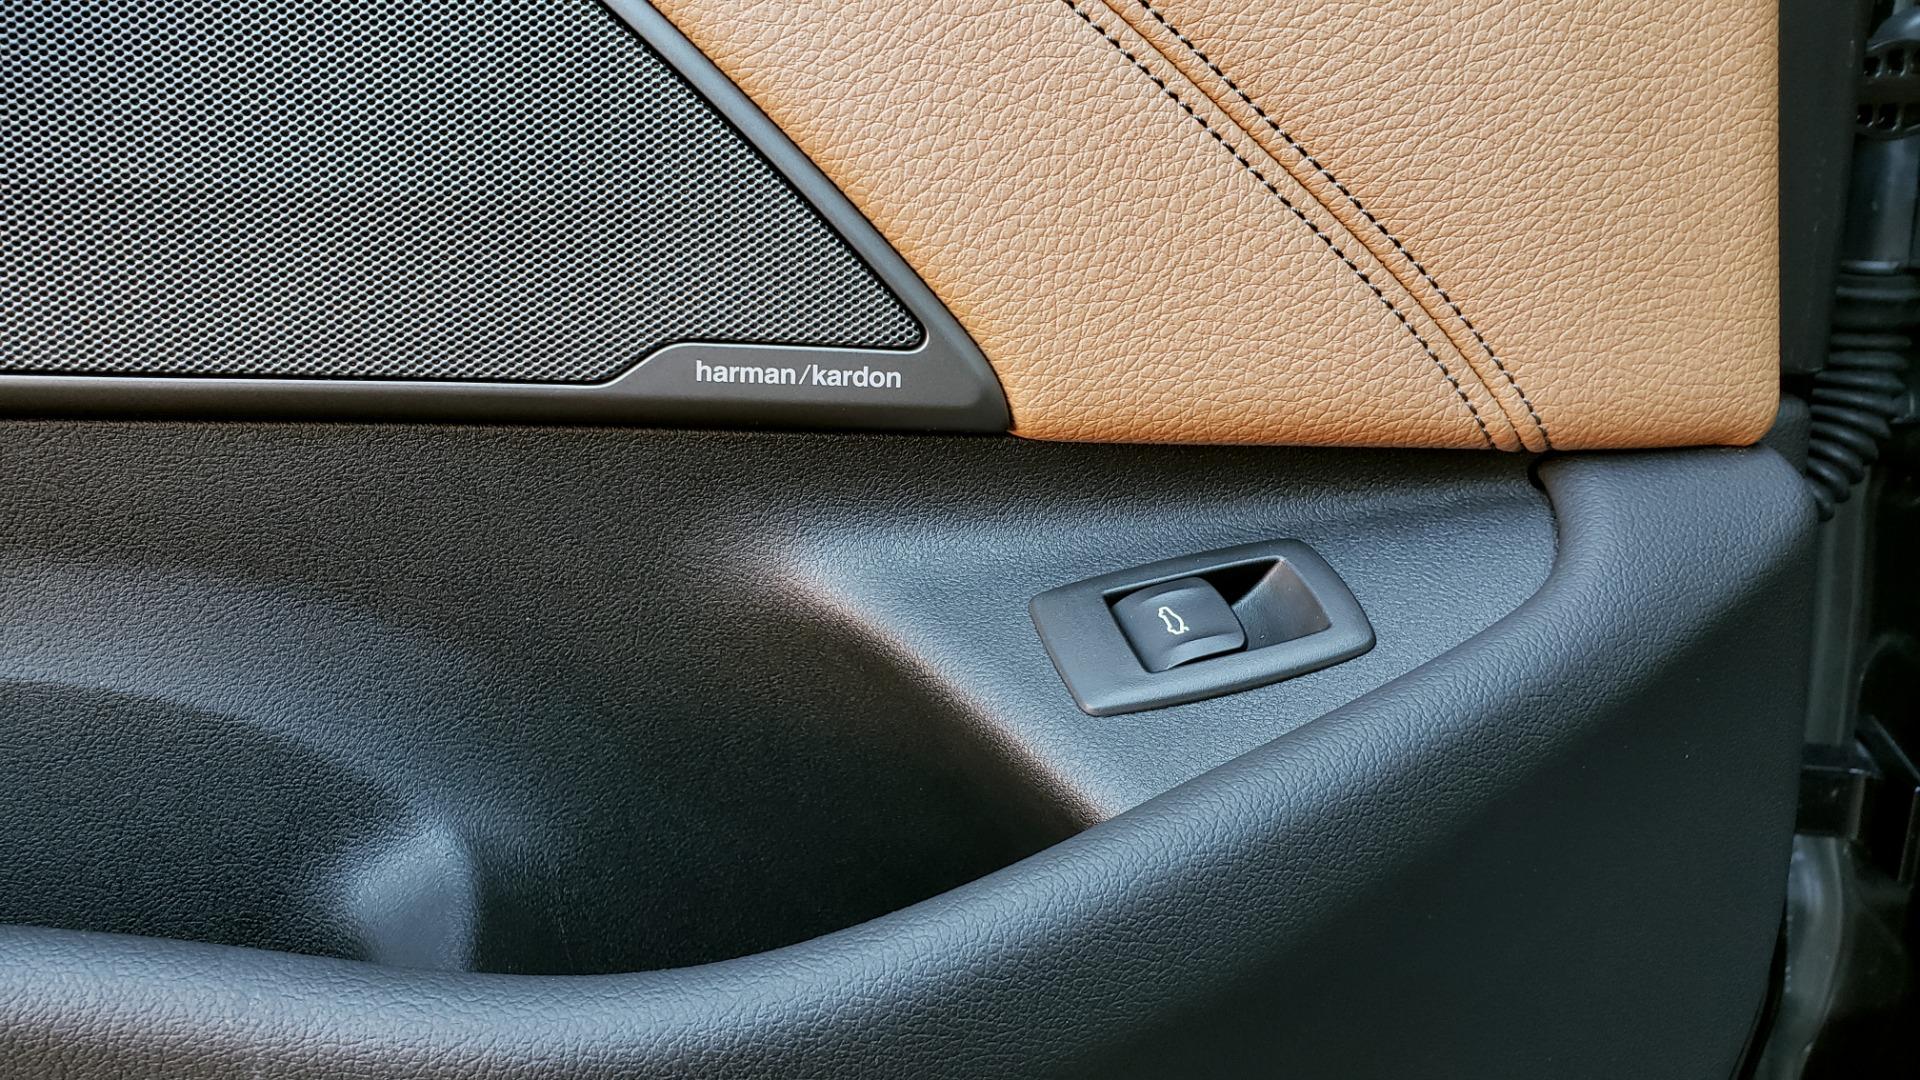 Used 2018 BMW 5 SERIES 540I M-SPORT / DRVR ASST / EXEC PKG / NAV / SUNROOF / HUD / REARVIEW for sale Sold at Formula Imports in Charlotte NC 28227 32